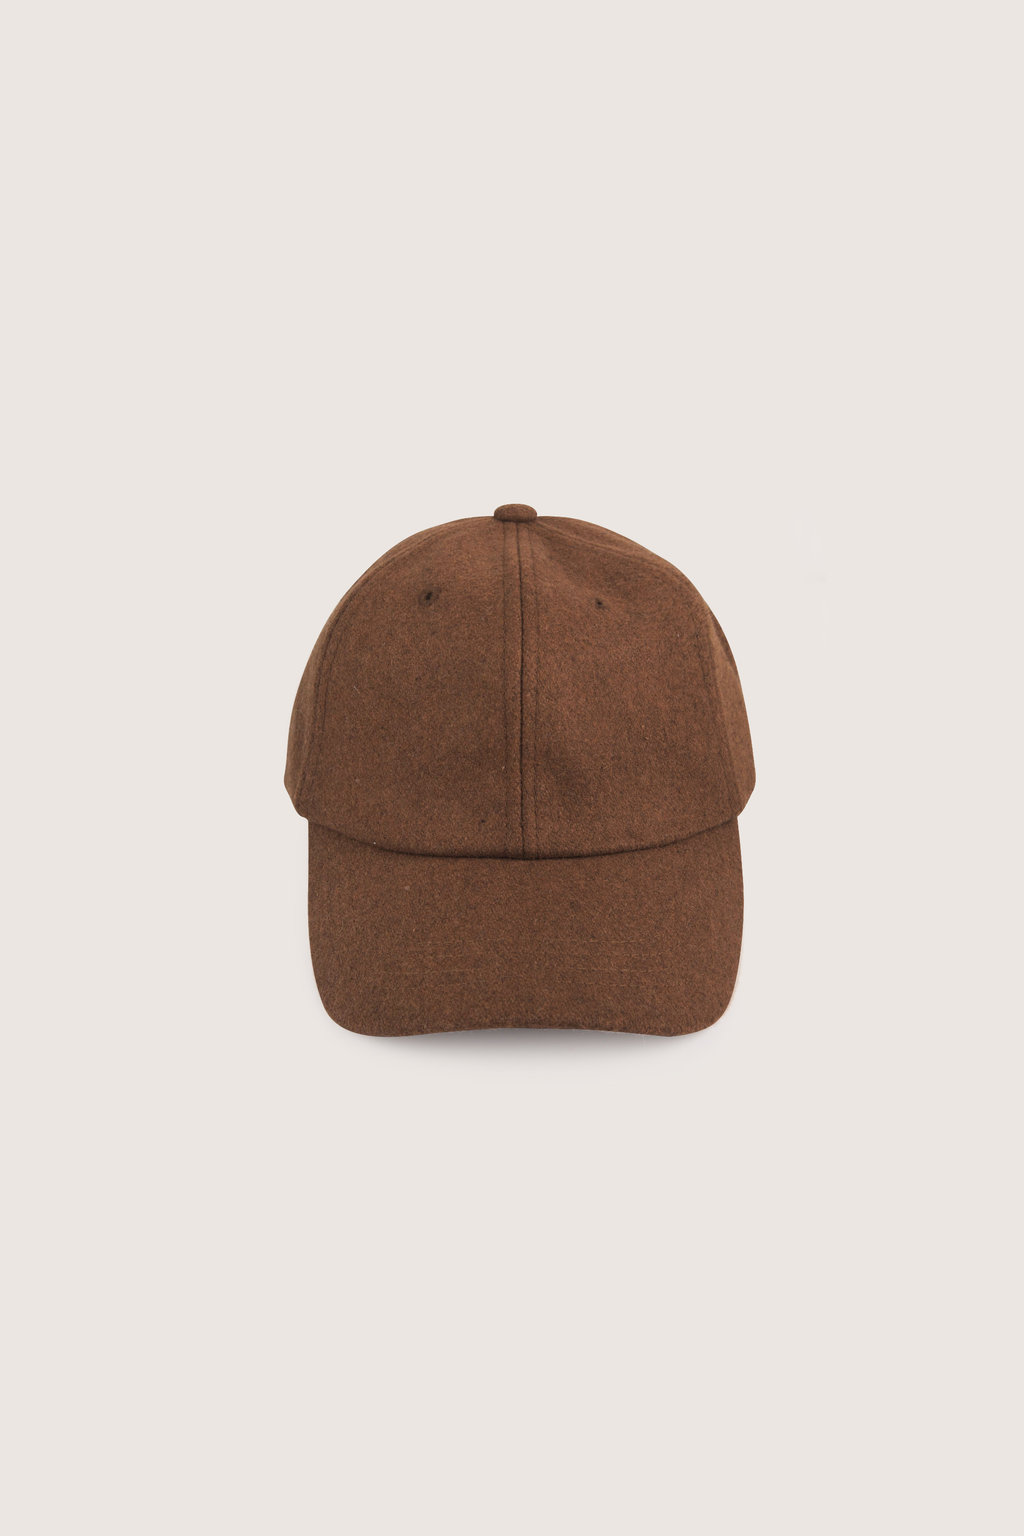 Hat H017 Brown 4